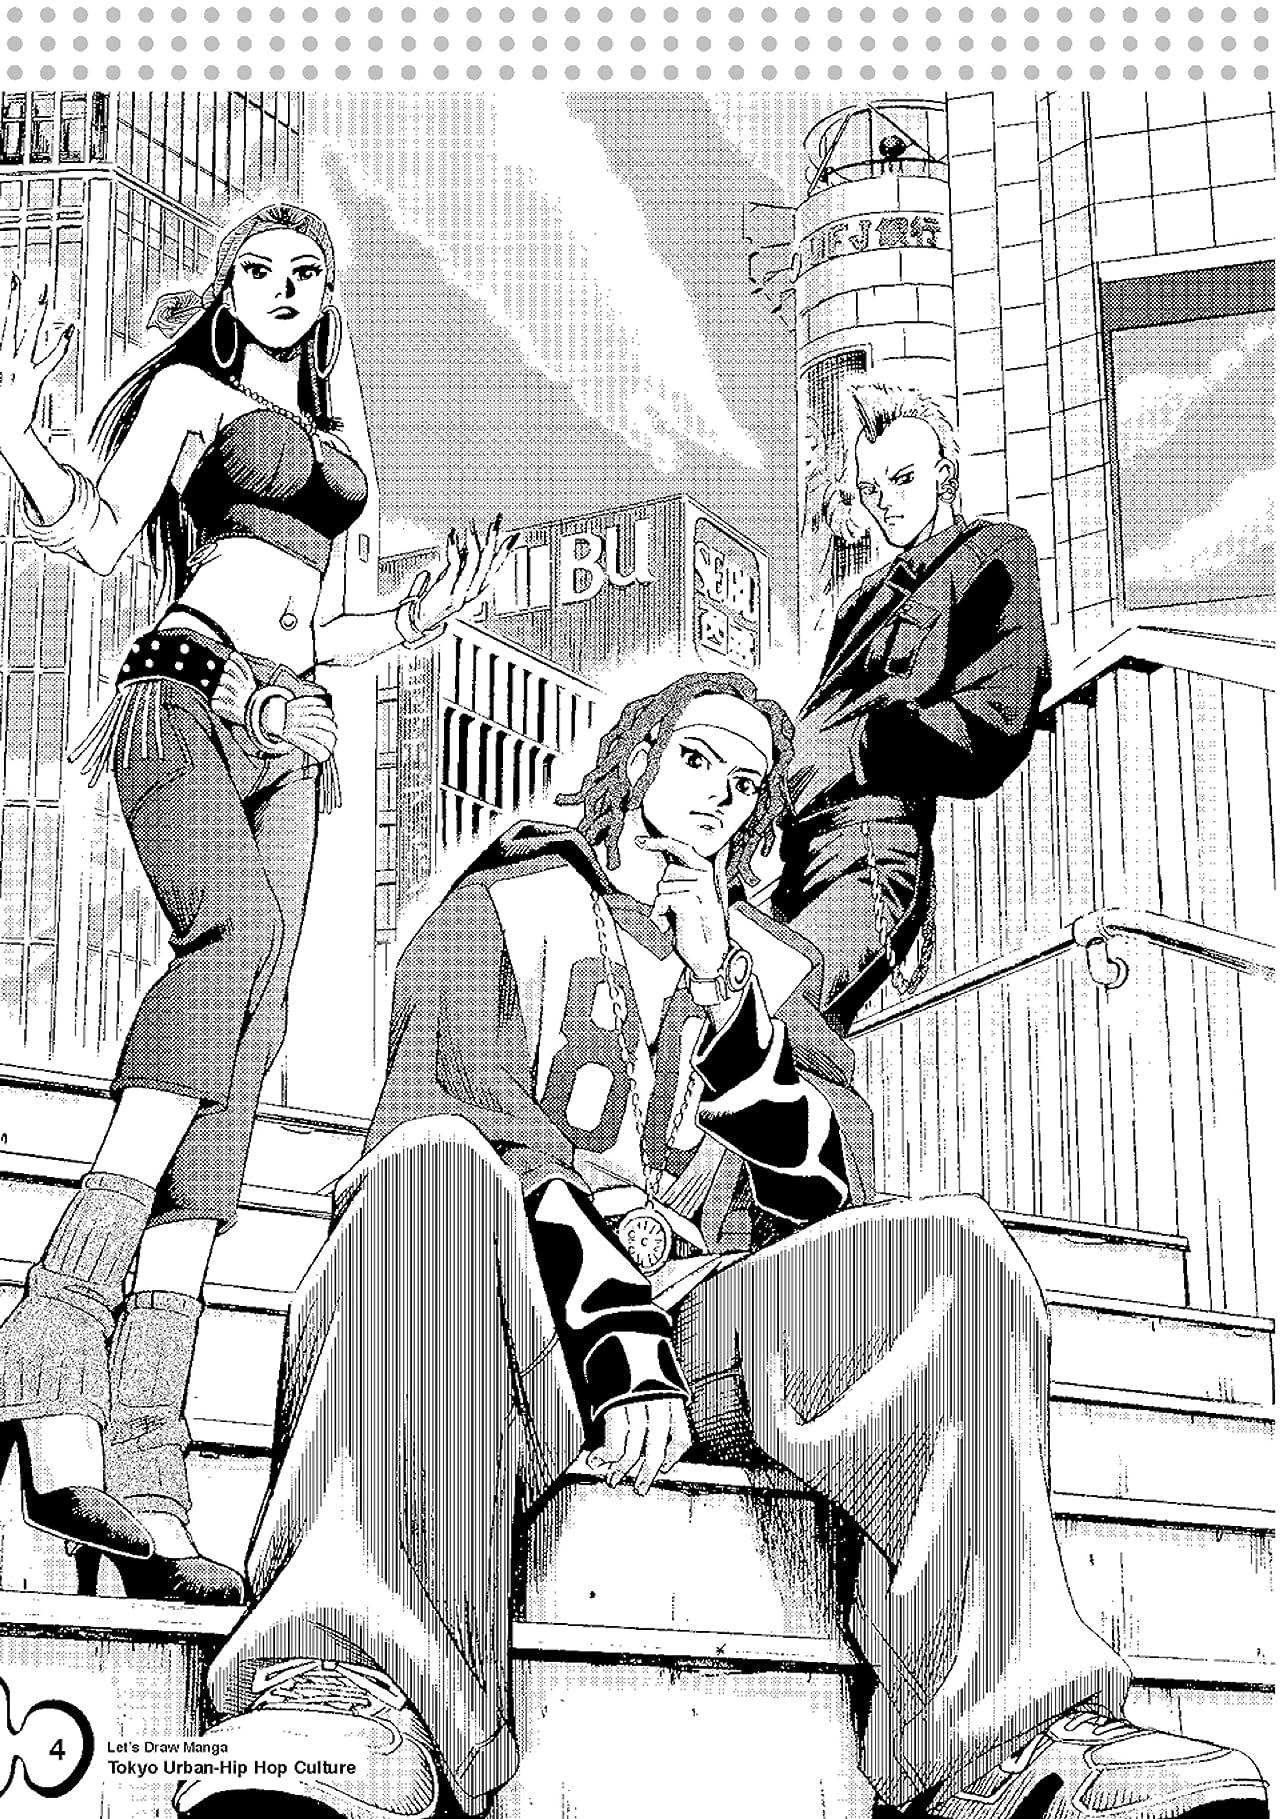 Let's Draw Manga: Tokyo-Urban Hip Hop Culture: Tokyo-Urban Hip Hop Culture Preview